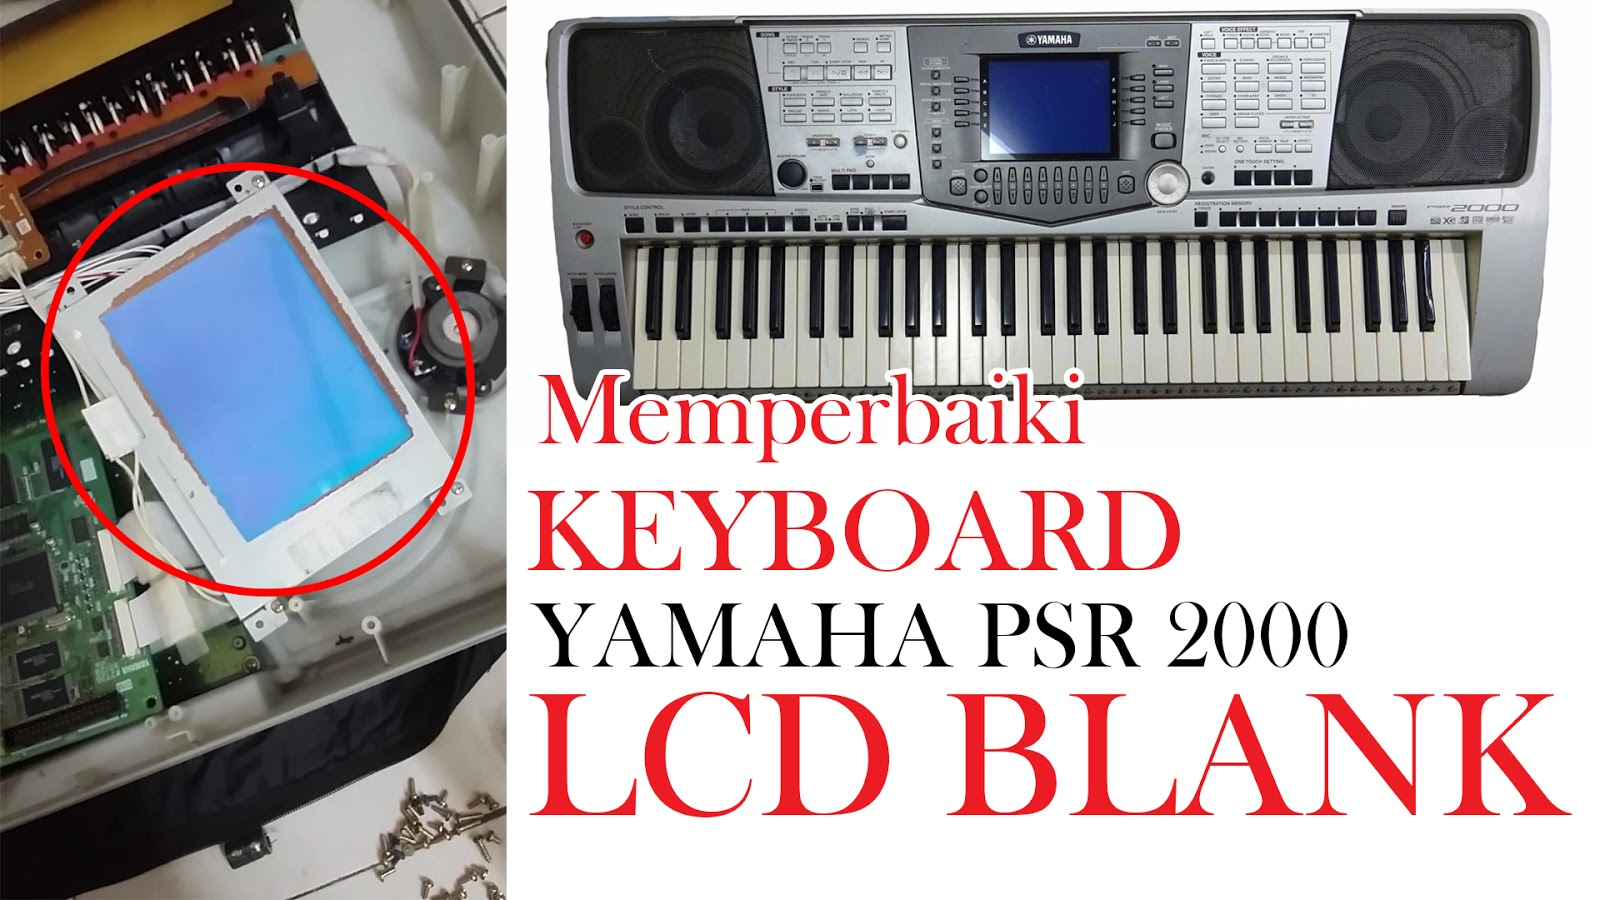 Cara Memperbaiki Keyboard Yamaha PSR 2000 LCD Blank   KopiCola Tutorial 2019